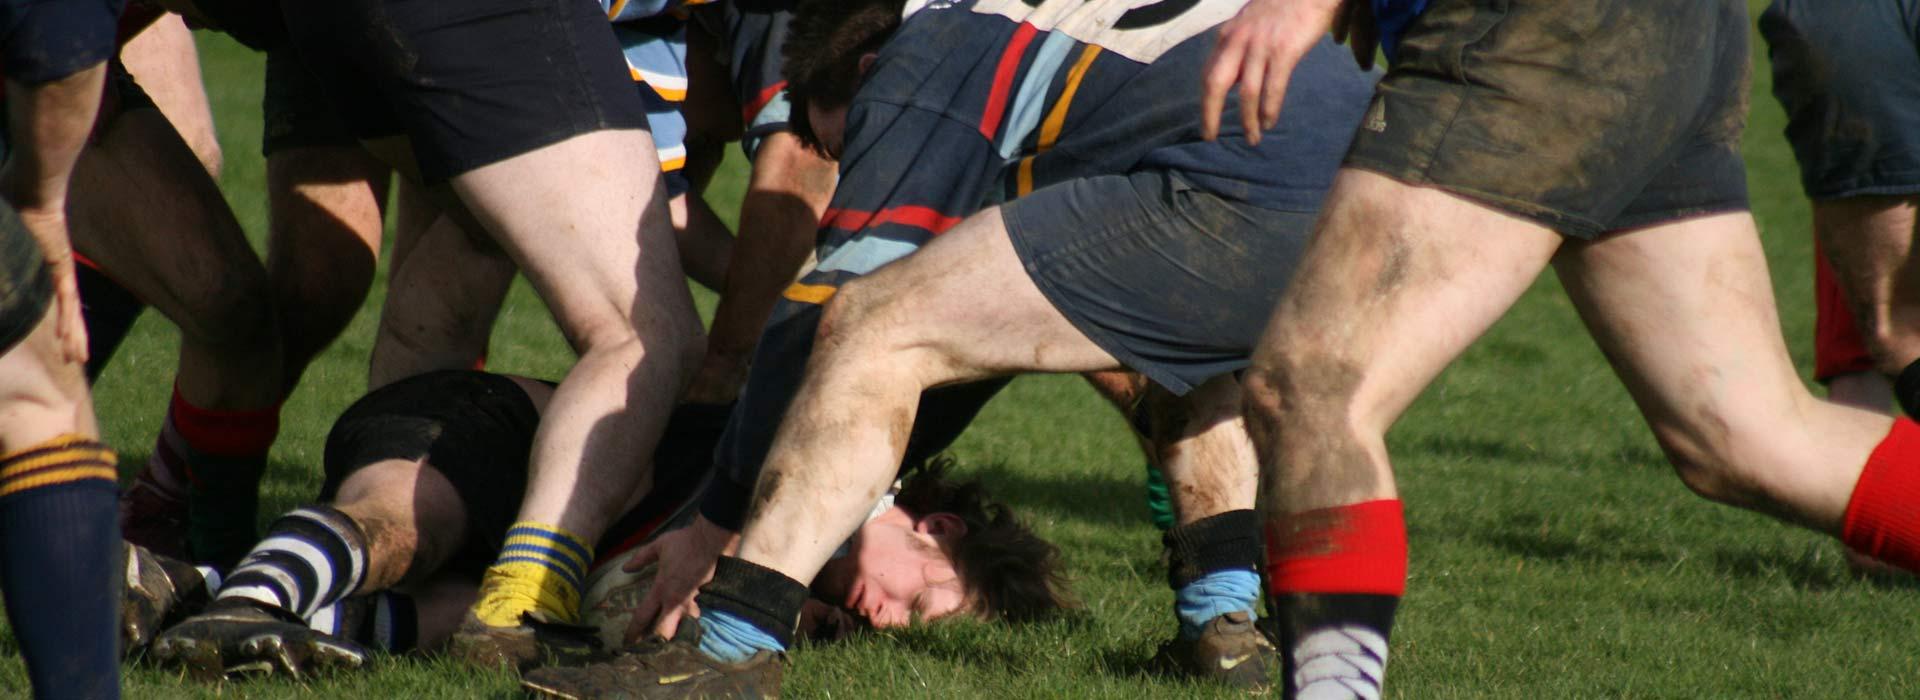 Northampton Sports Injuries